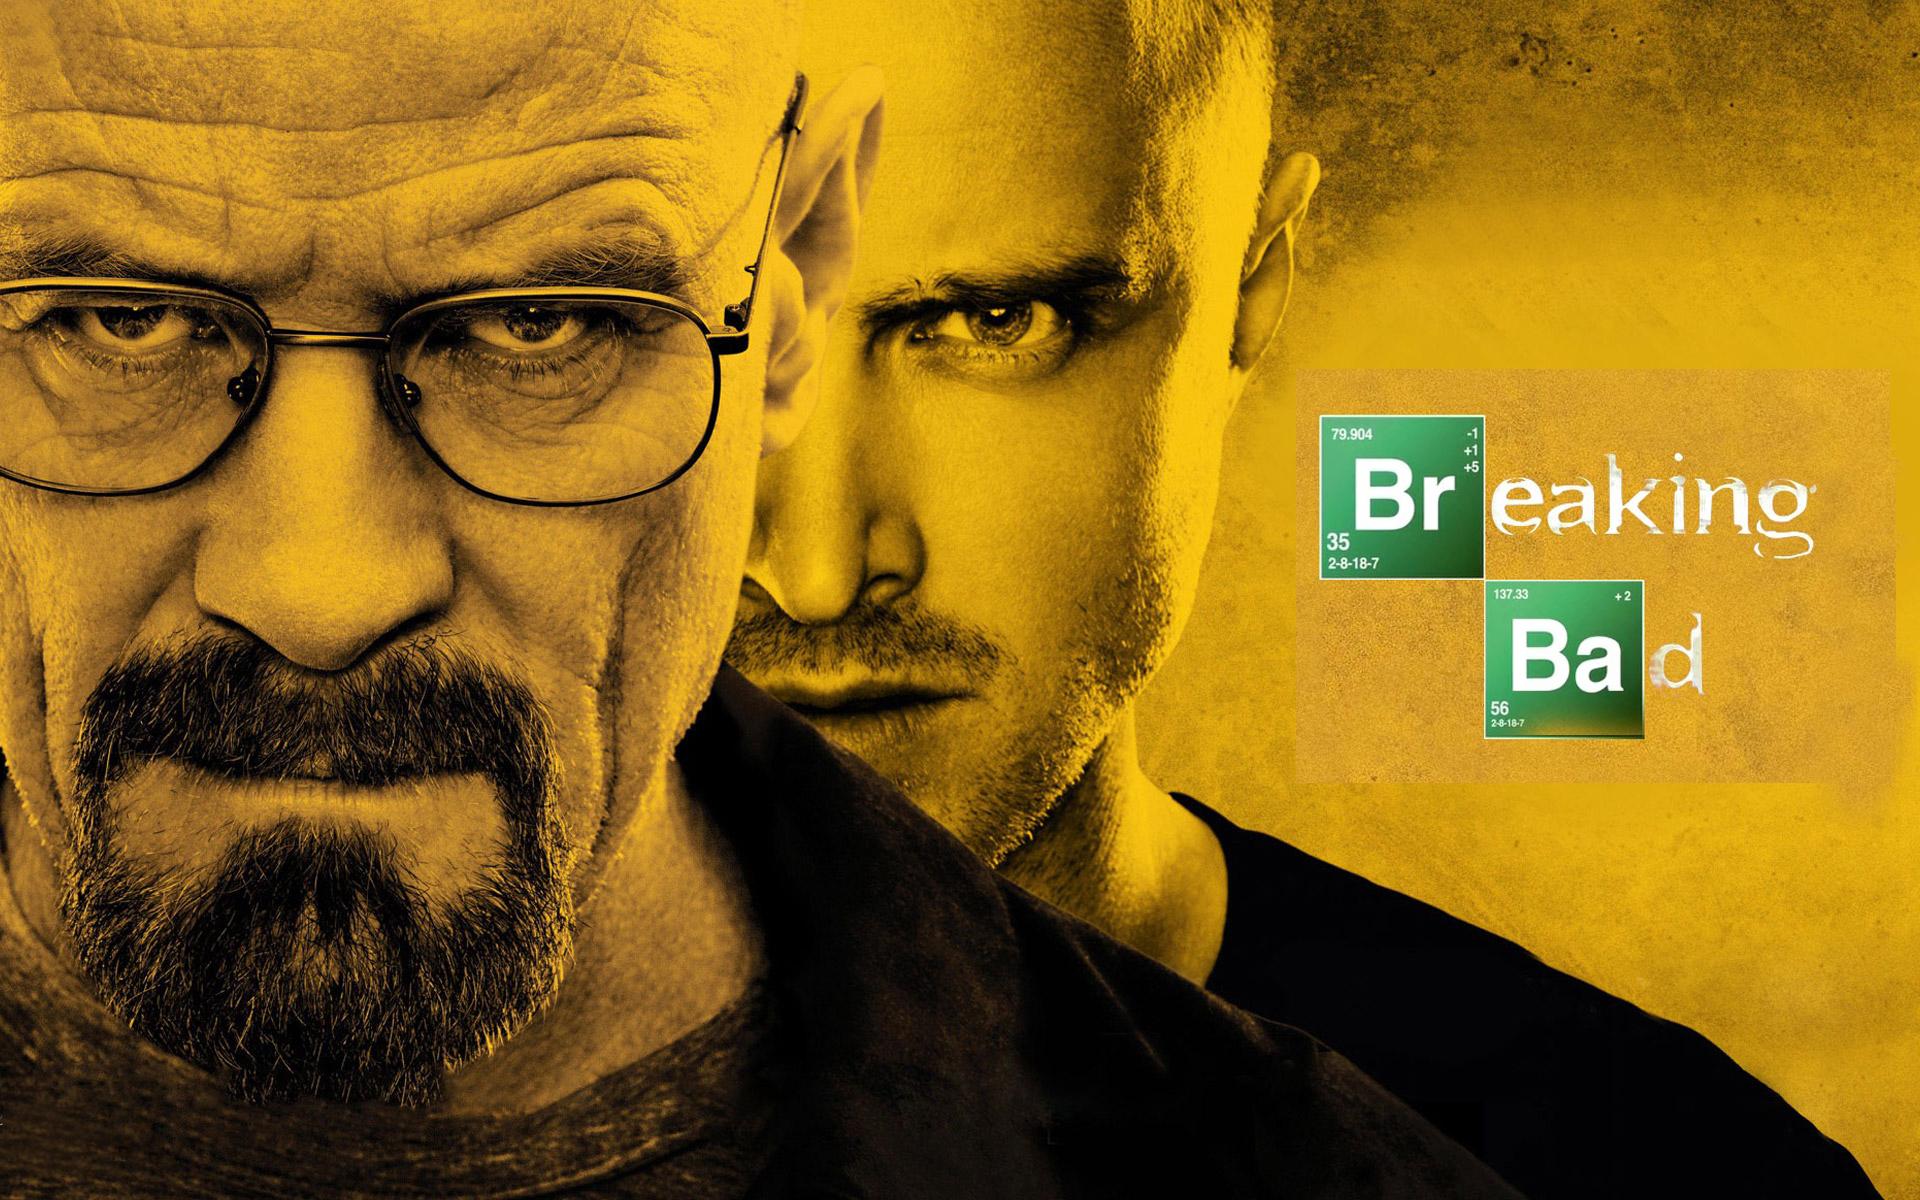 دیالوگی ماندگار از سریال Breaking Bad